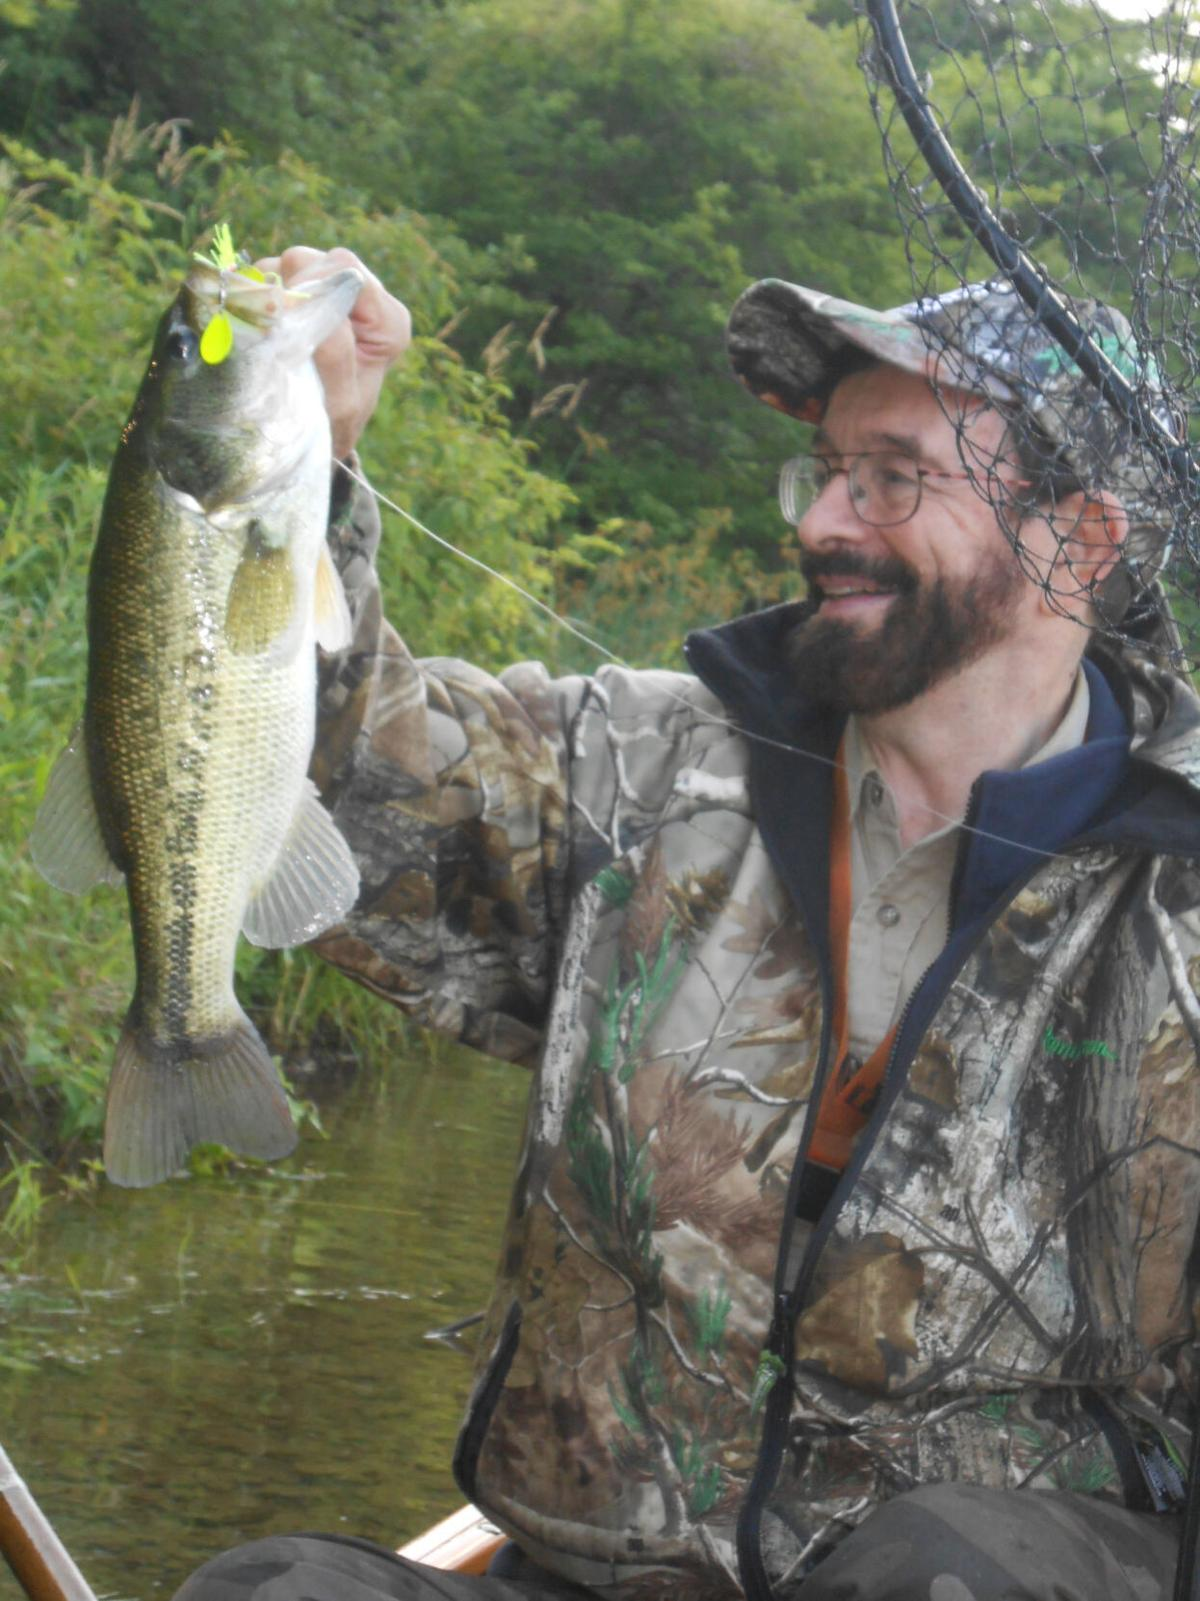 Robertson: An all-around fishing pole?